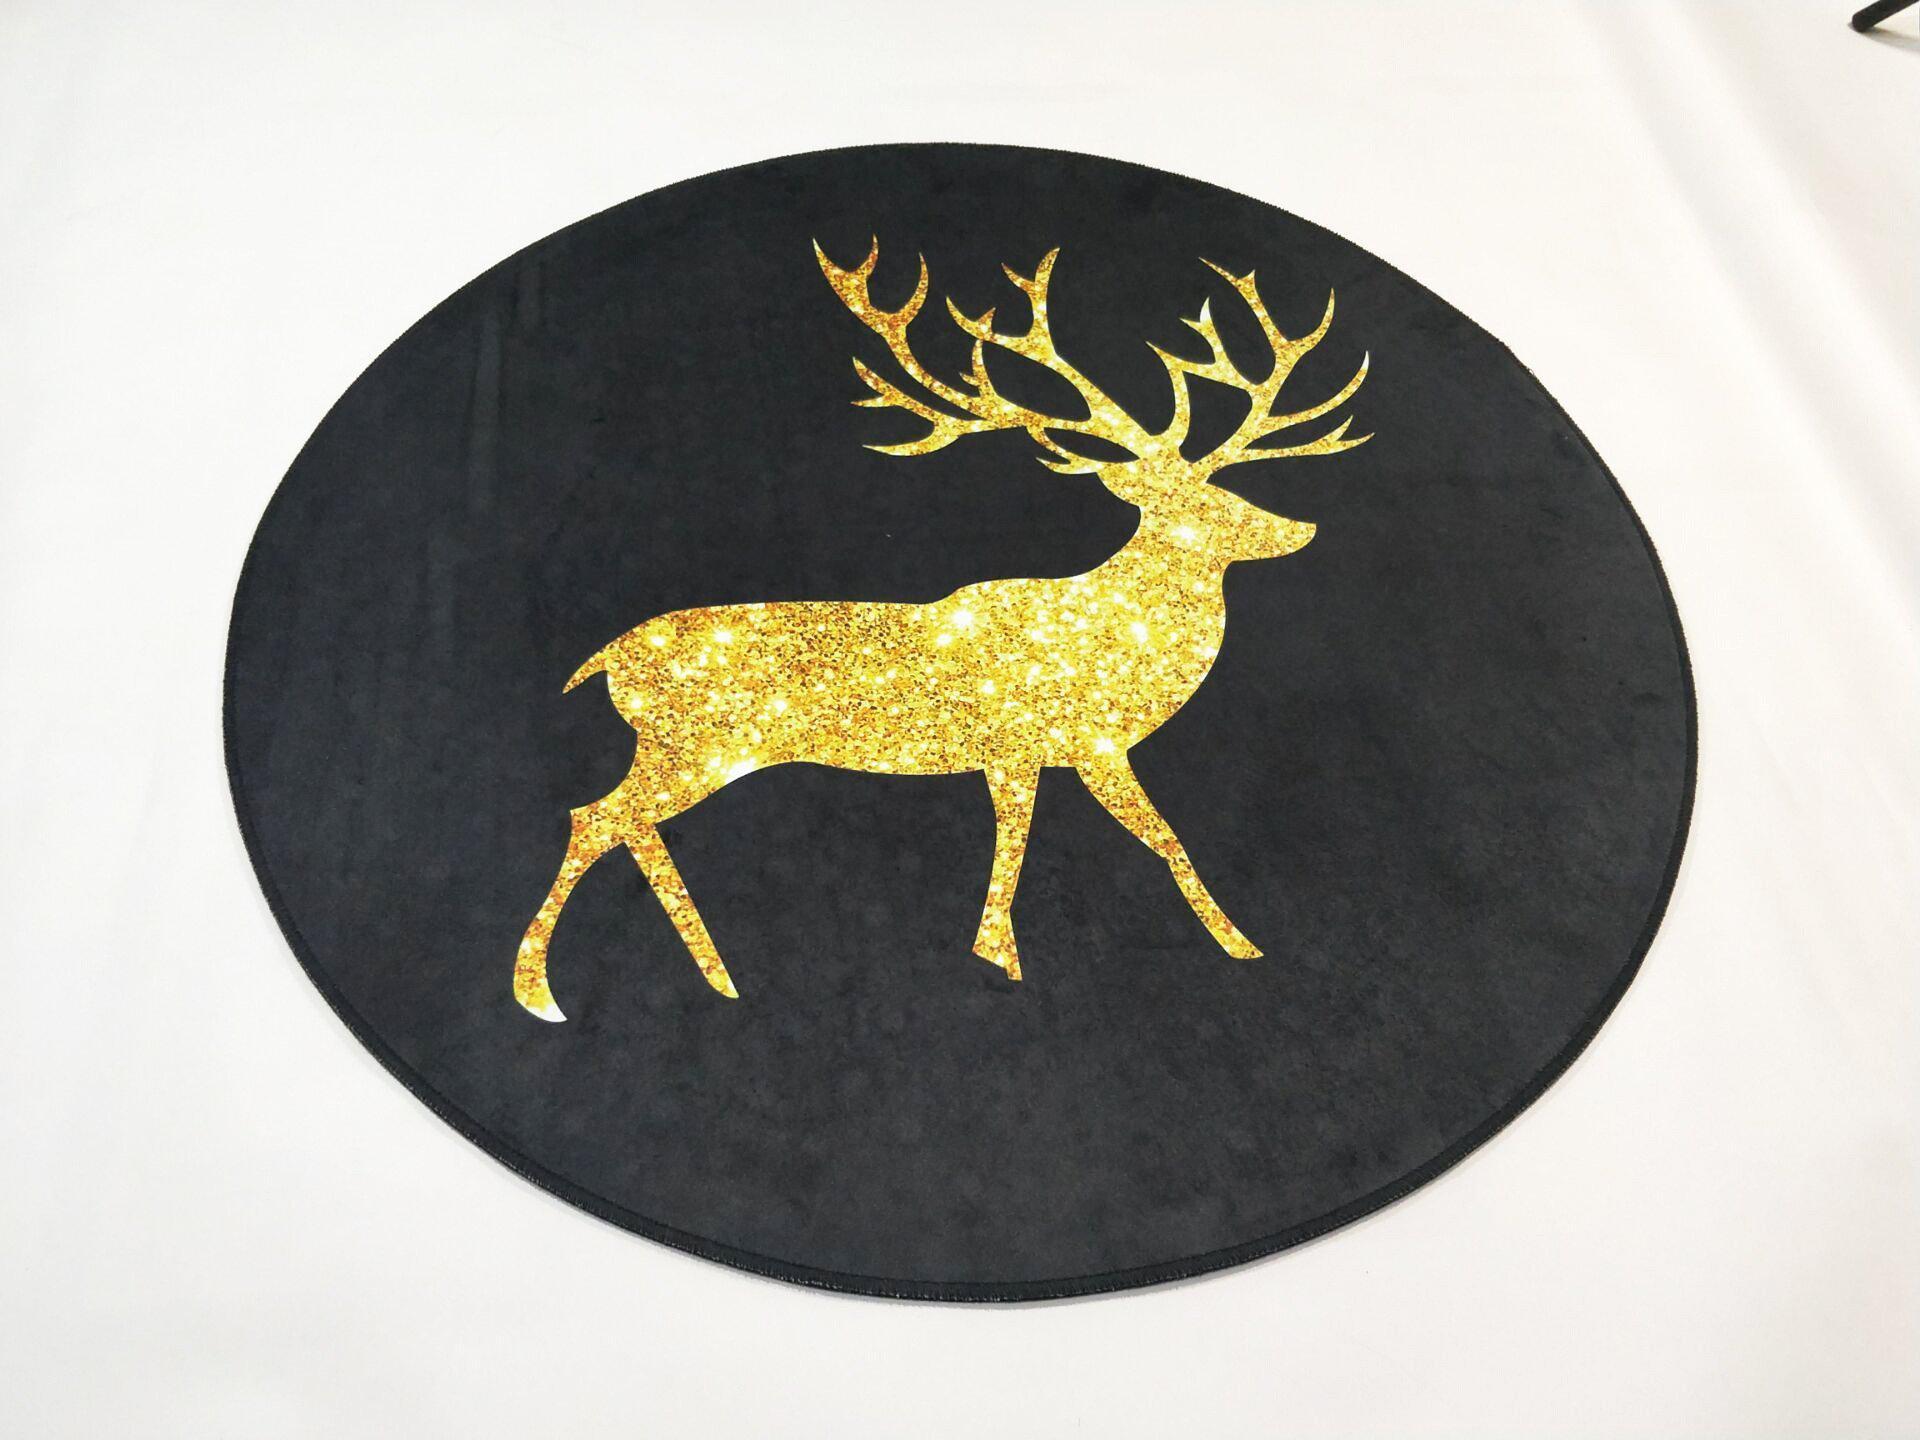 Runder Teppich <br> Goldfarbe